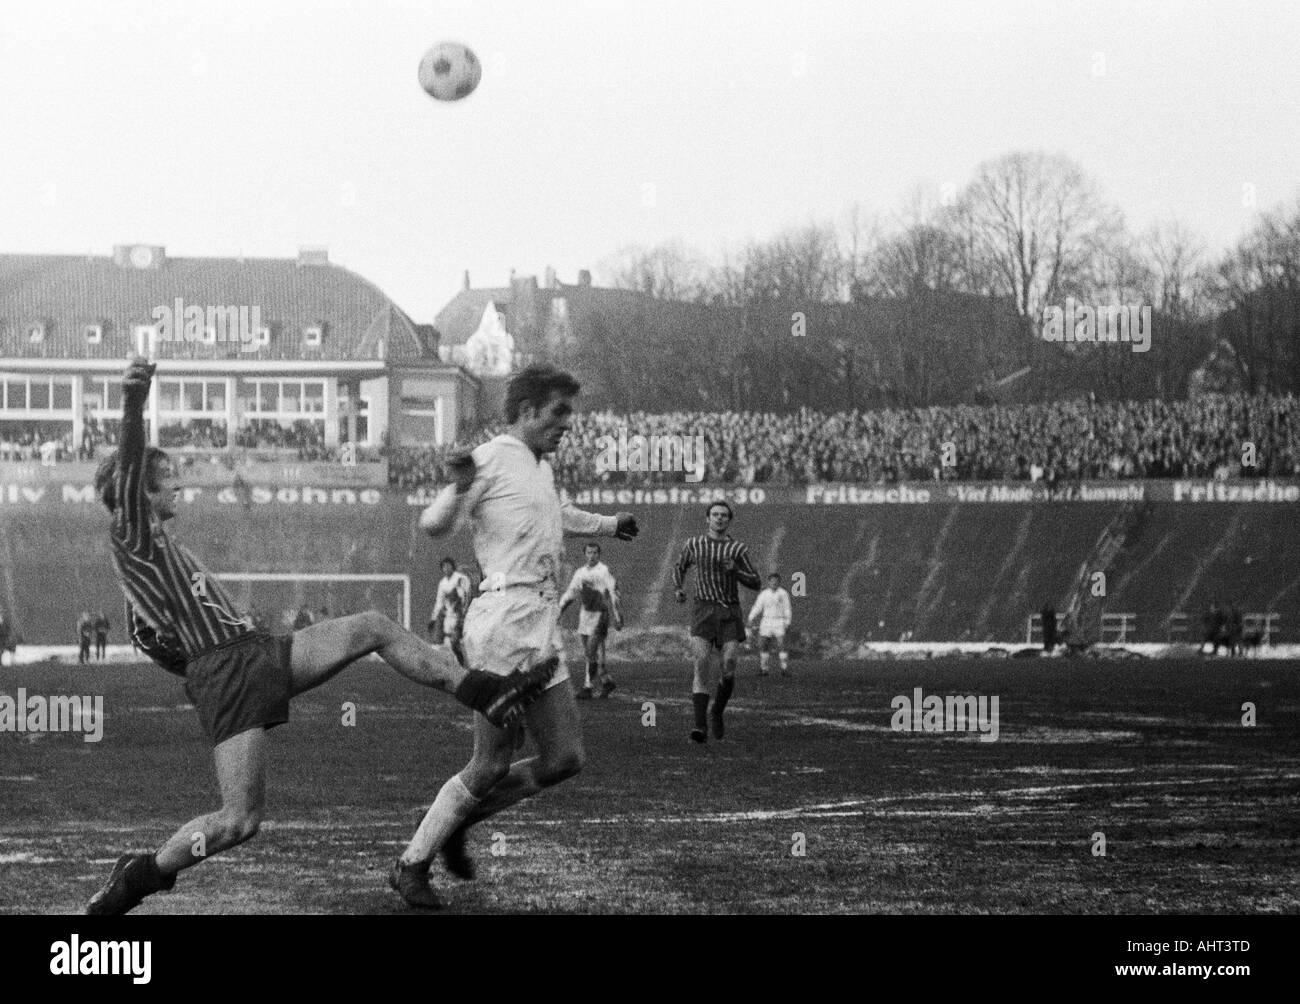 football, Regionalliga West, 1970/1971, Stadium am Zoo in Wuppertal, Wuppertaler SV versus Fortuna Duesseldorf 1:1, scene of the match, duel between Robert Begerau (Ddorf) left and Juergen Kohle (WSV) - Stock Image